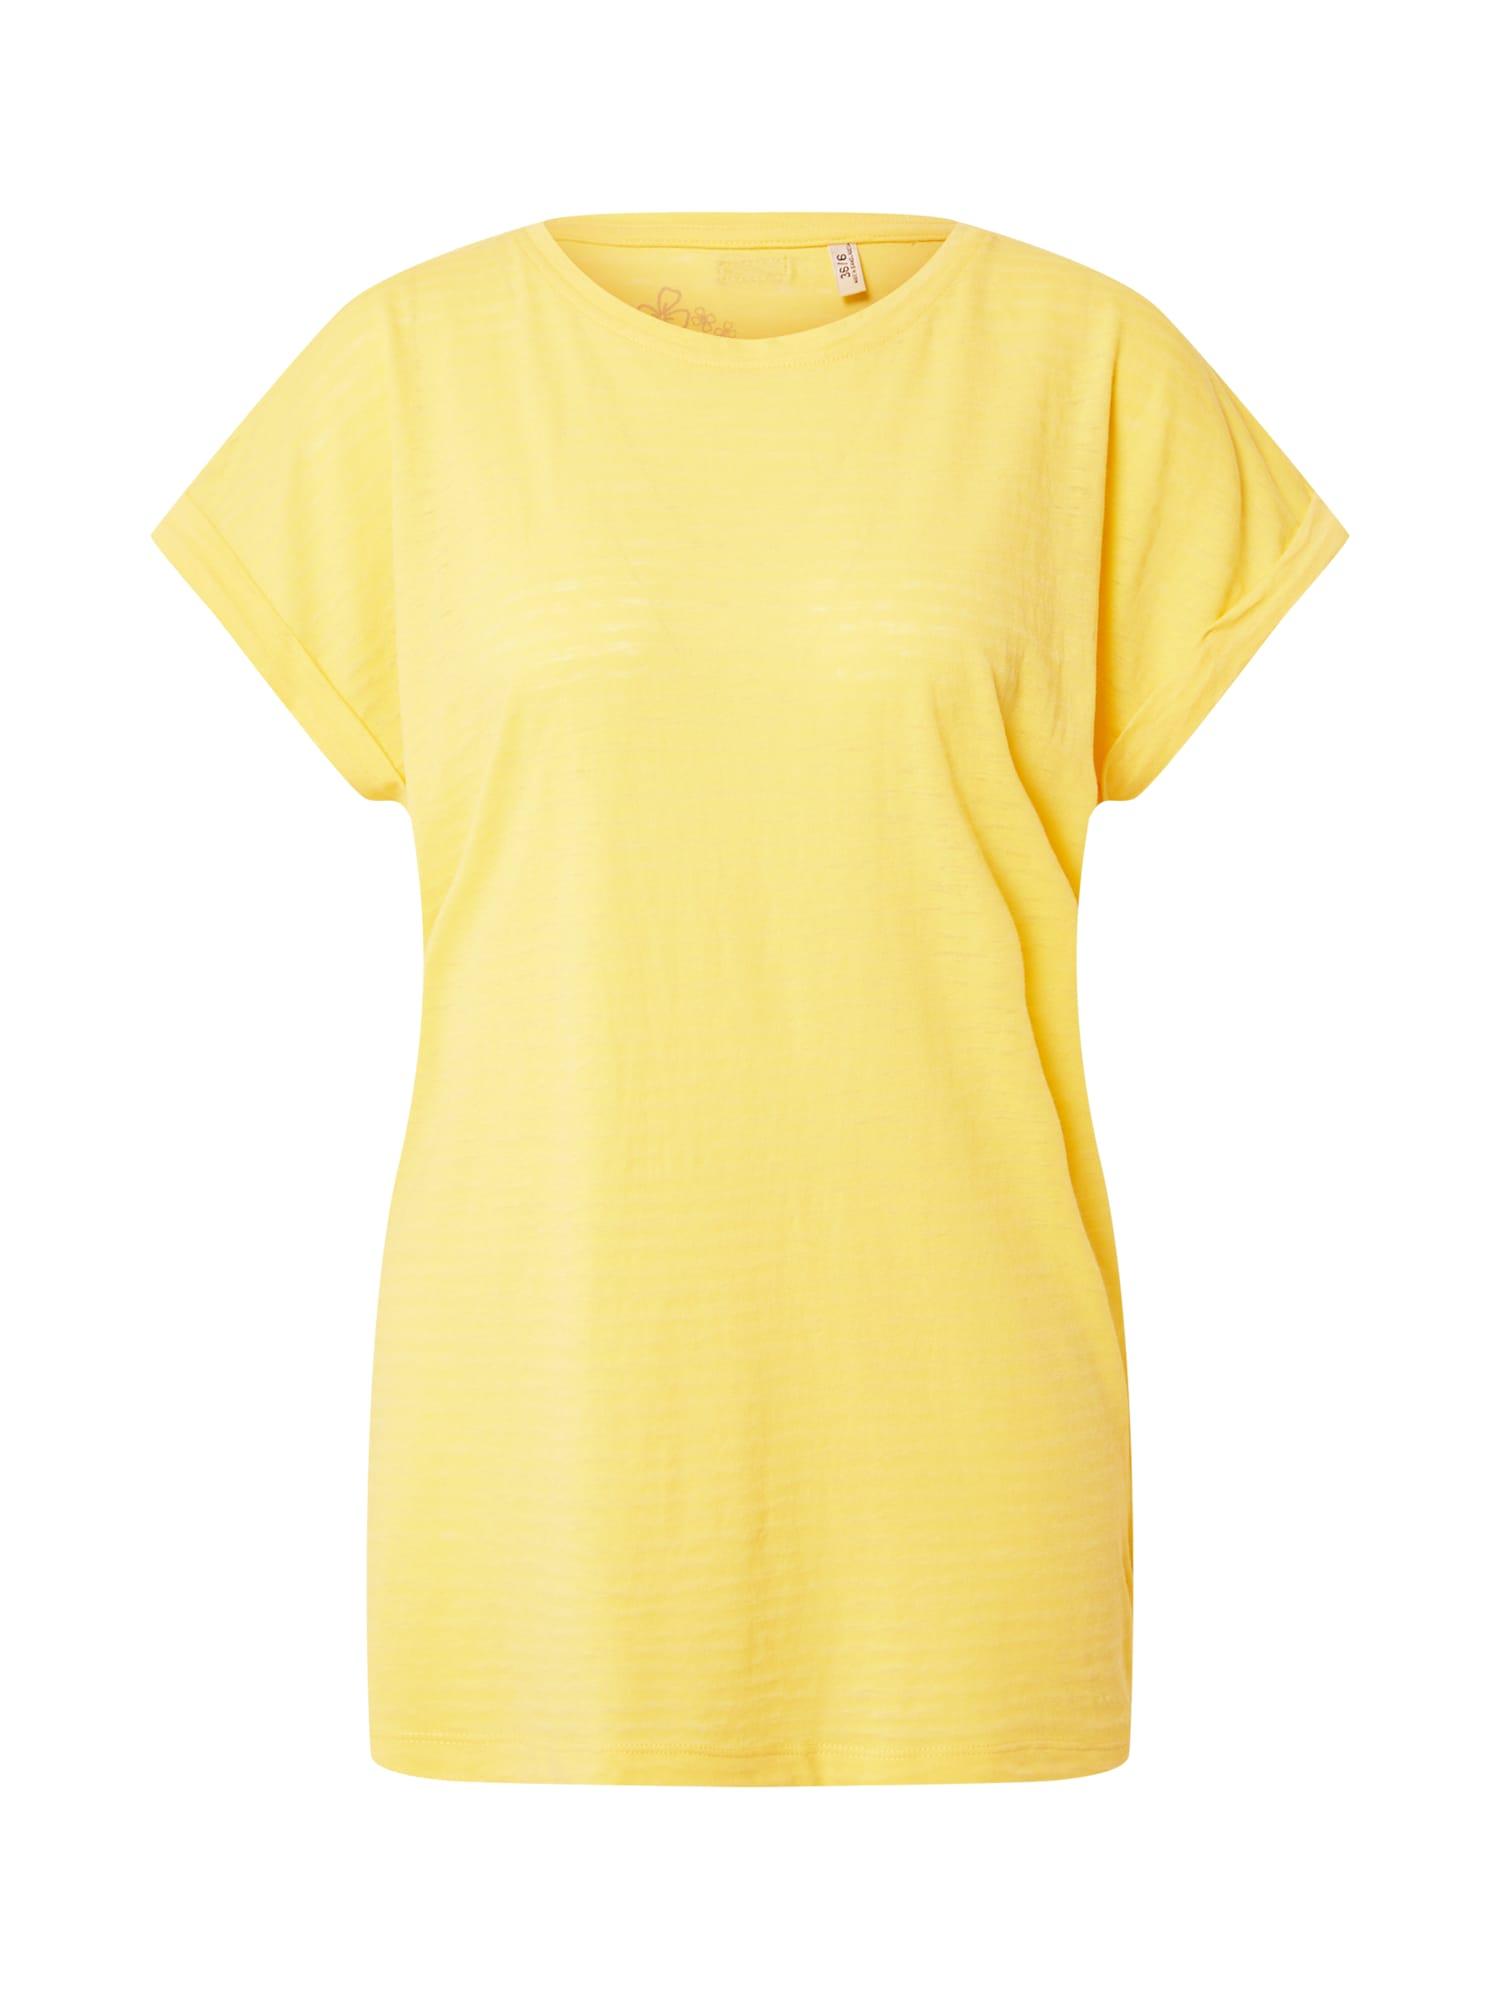 G.I.G.A. DX by killtec Sportiniai marškinėliai citrinos spalva